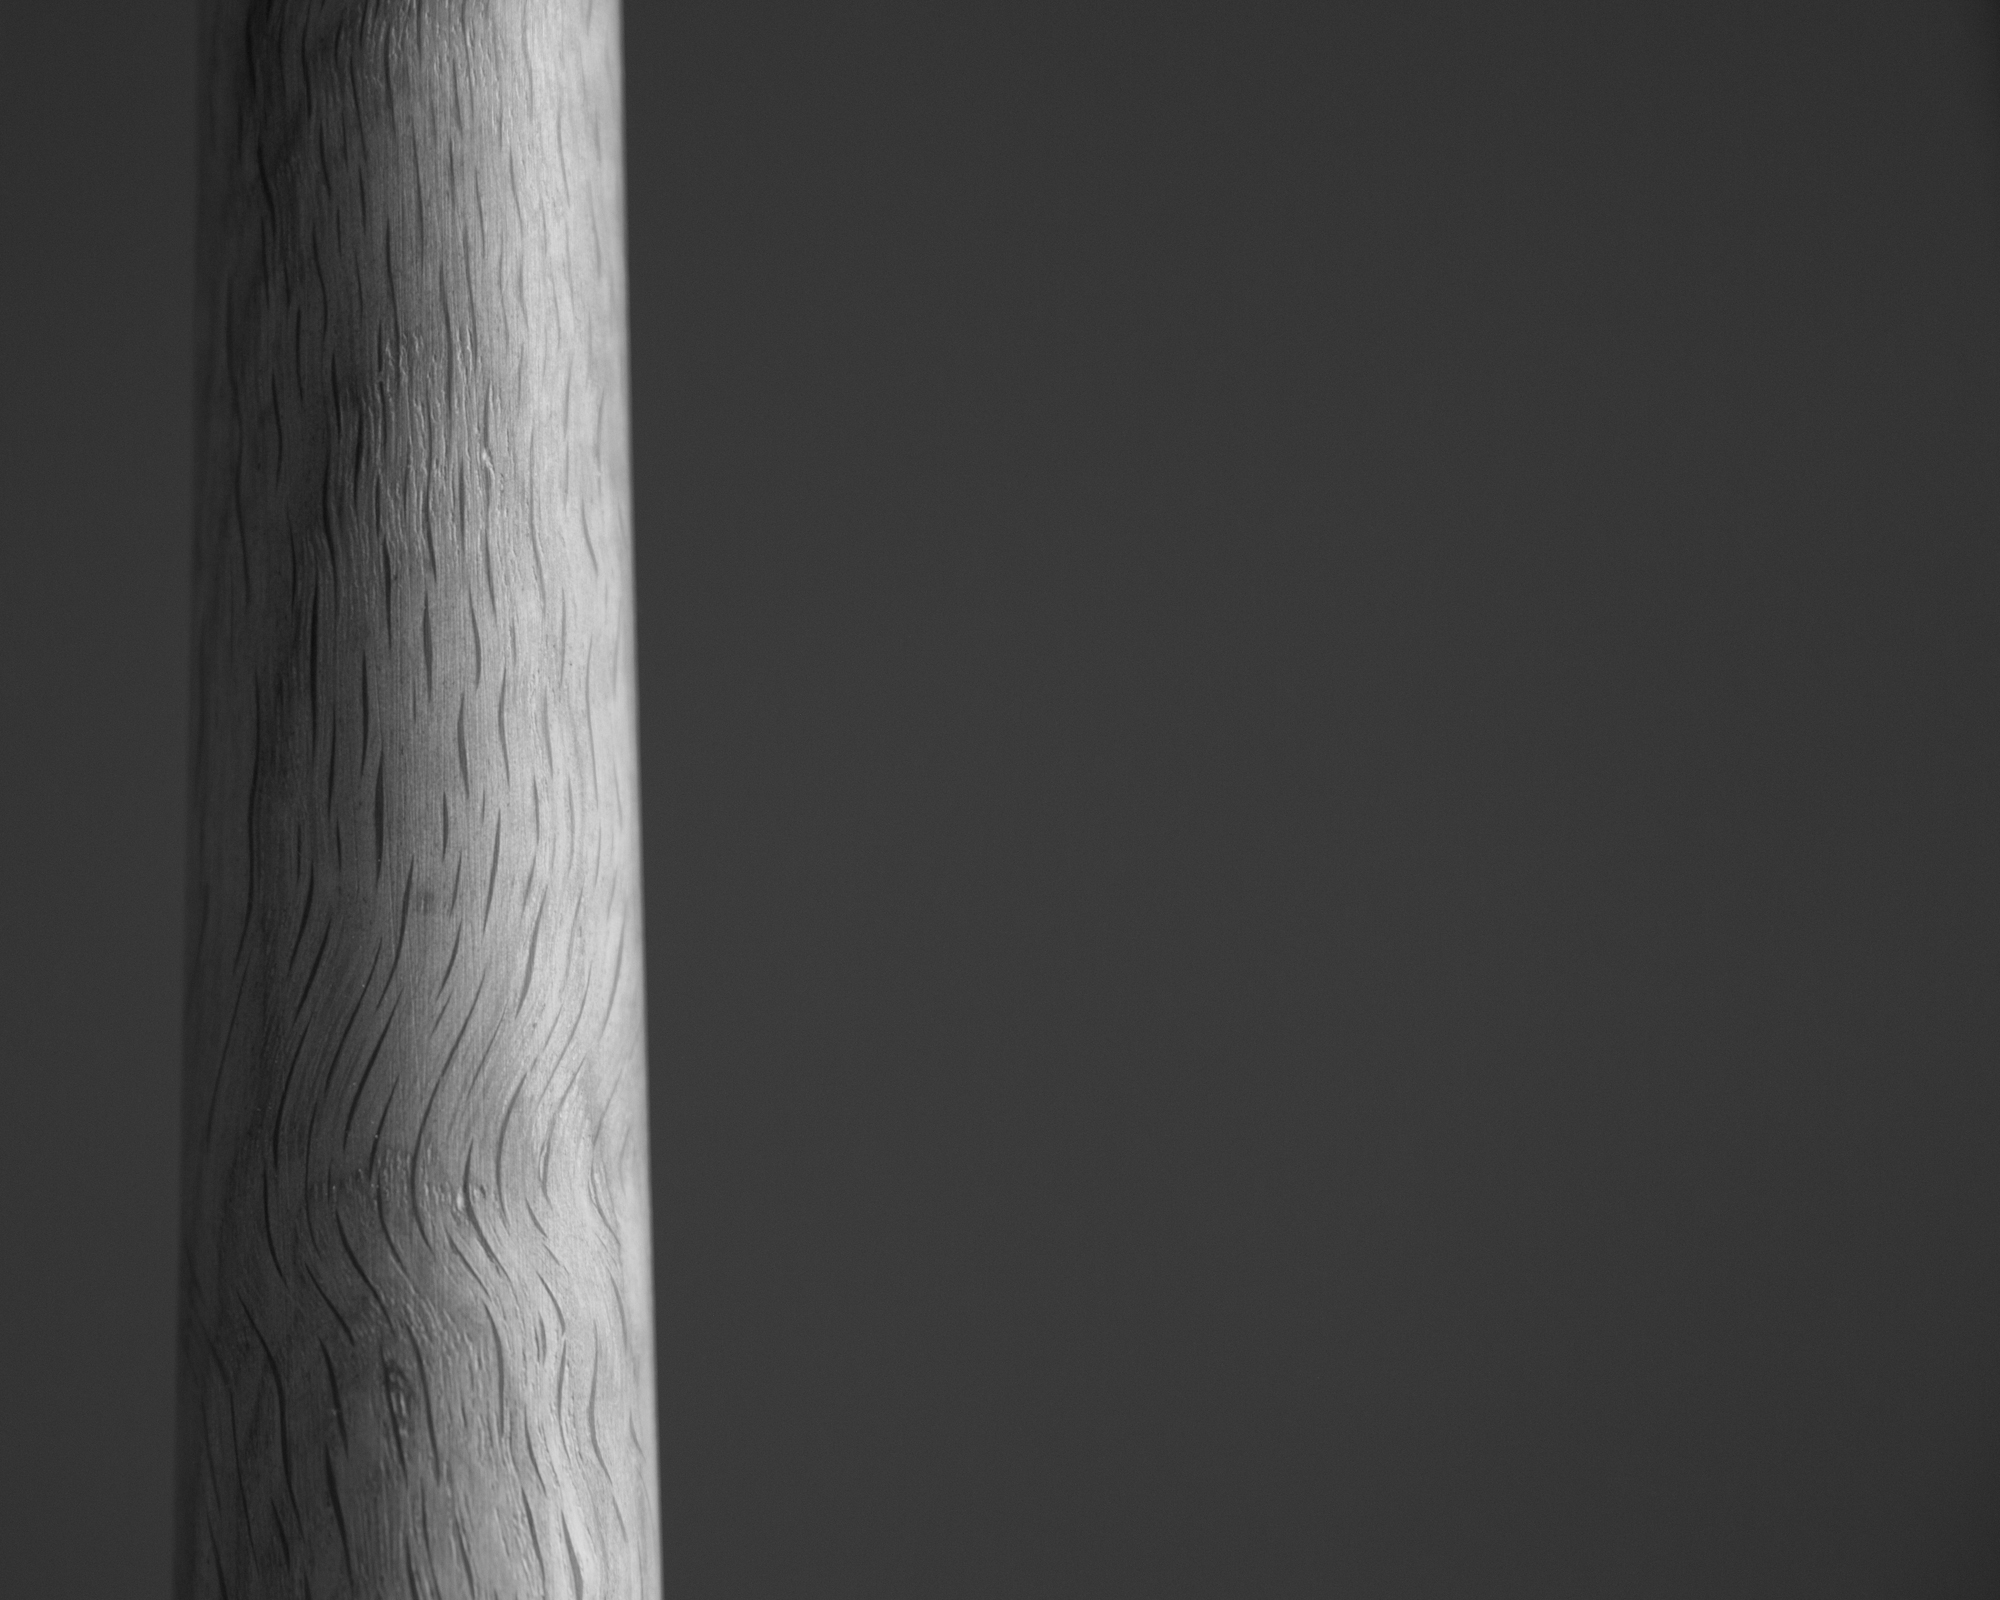 stools-card-19.jpg